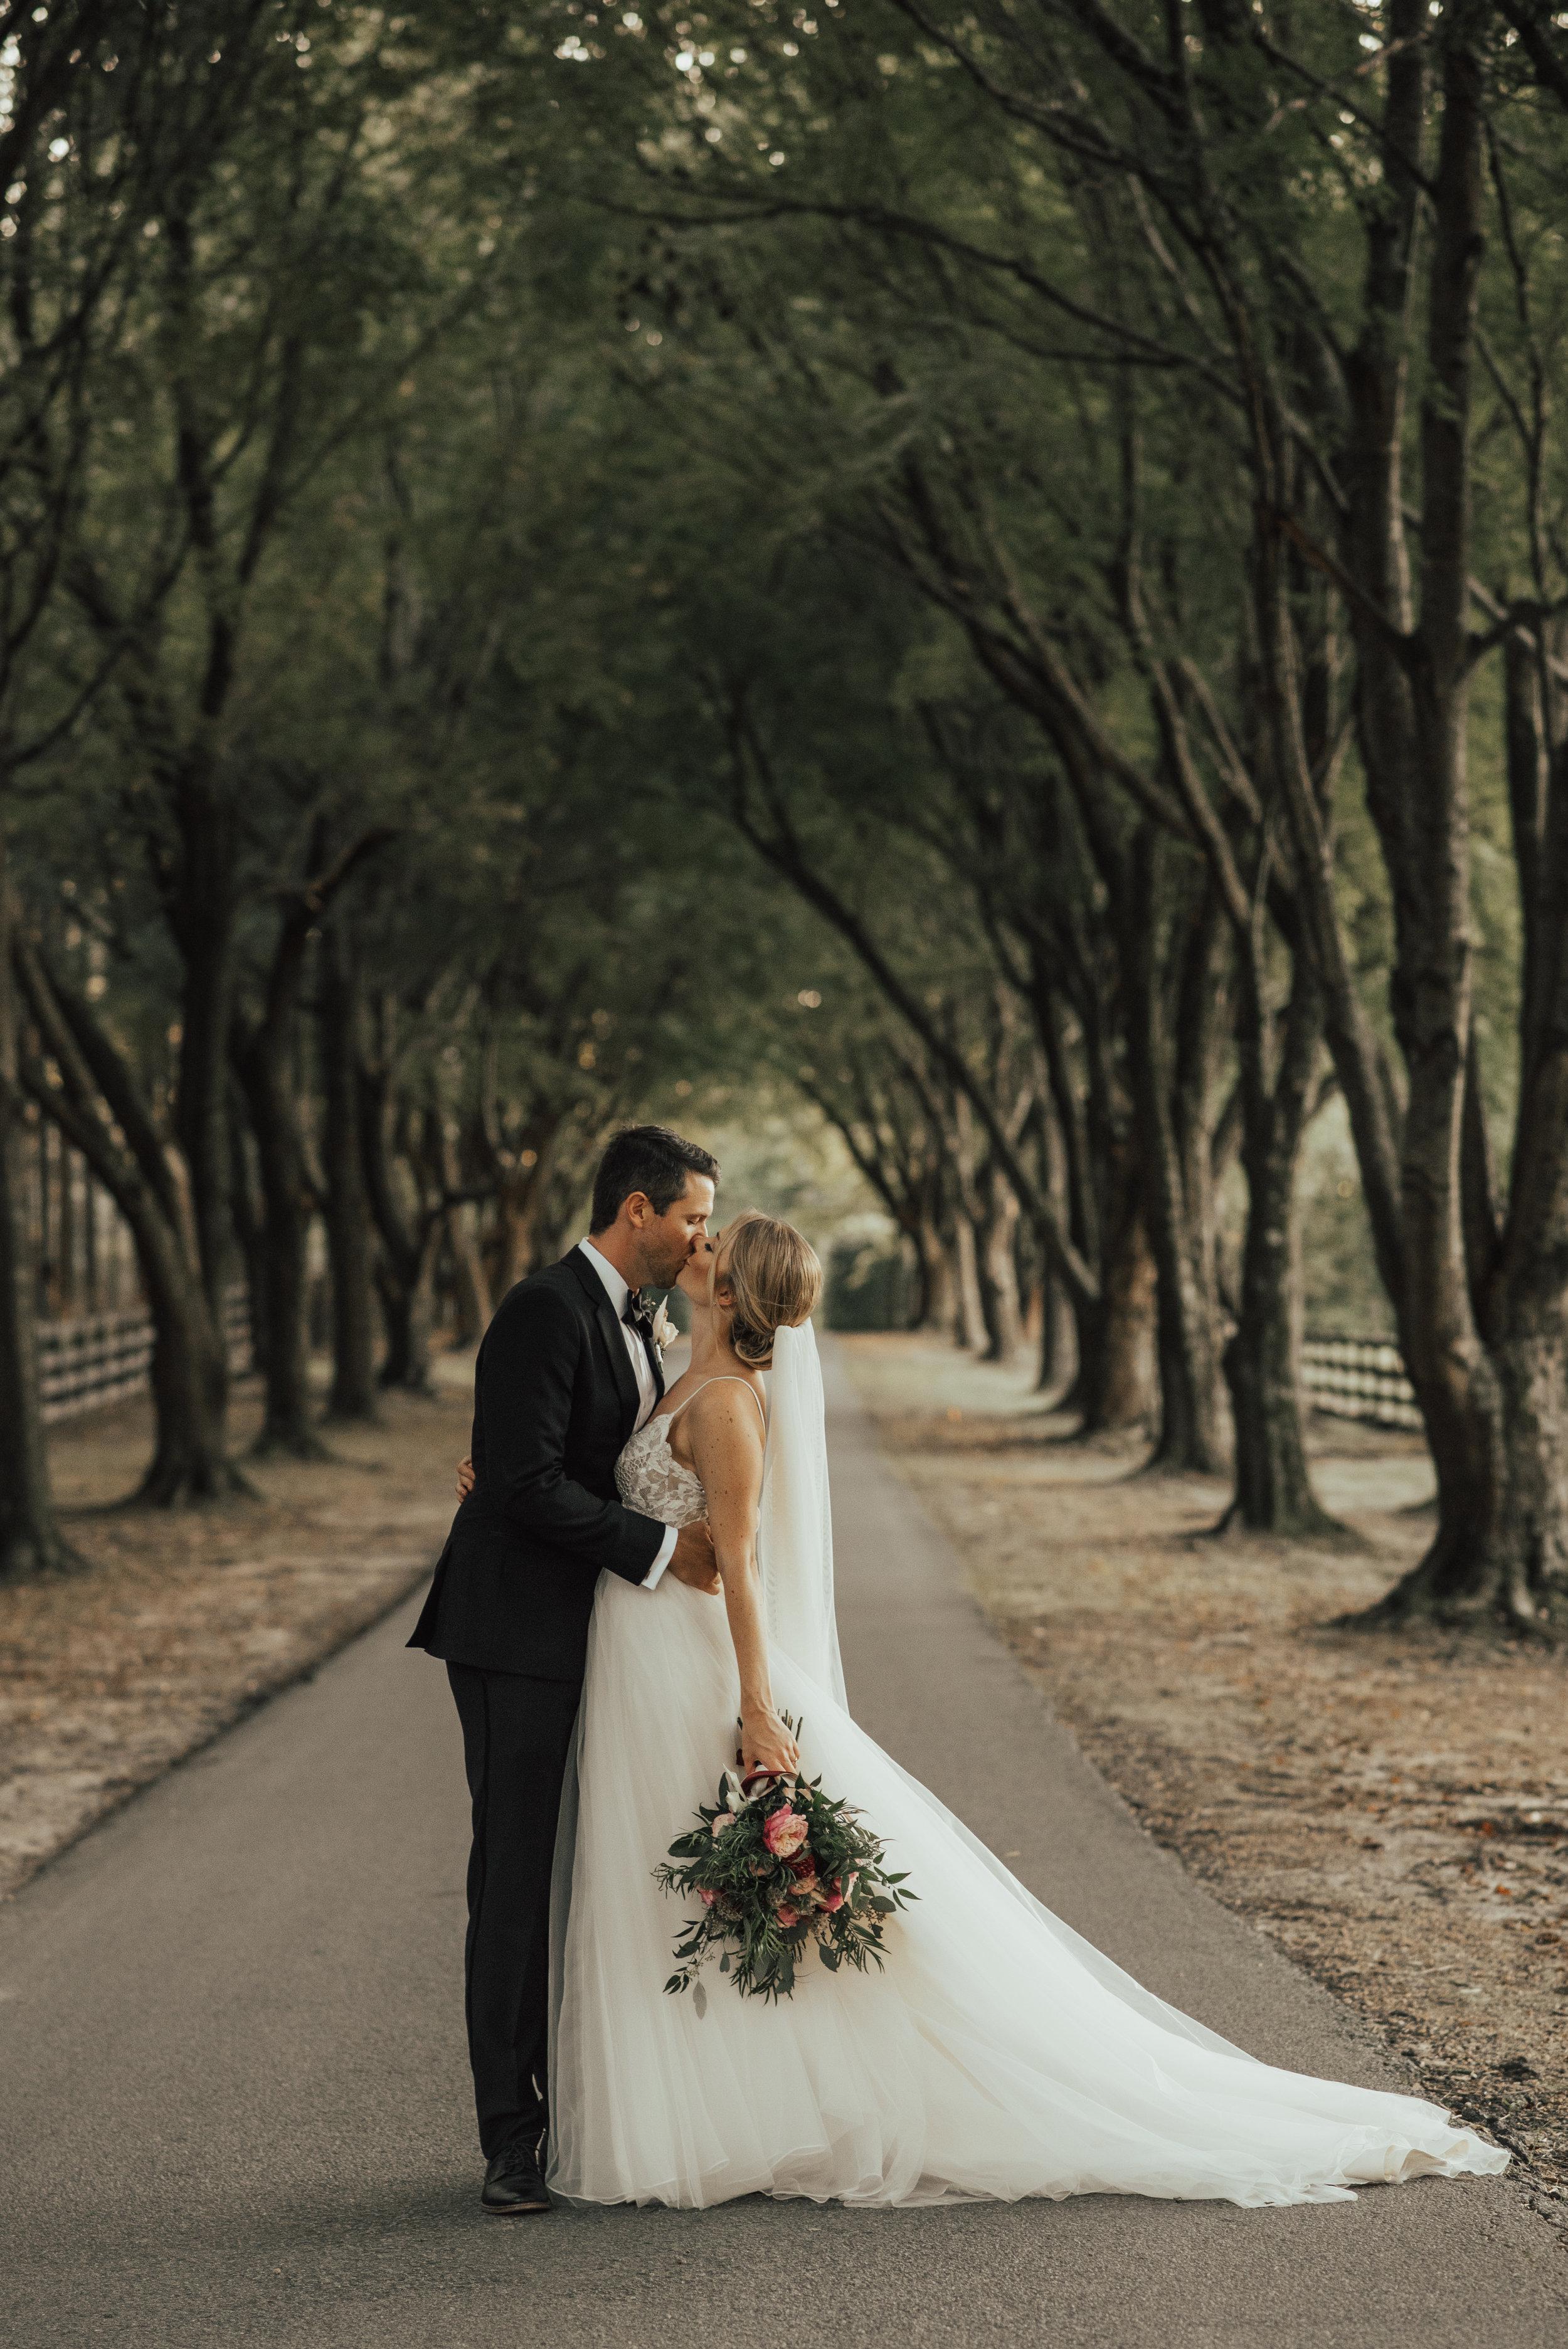 Smithfield Wedding By SB Photographs1301301301300130130130130130130.jpg